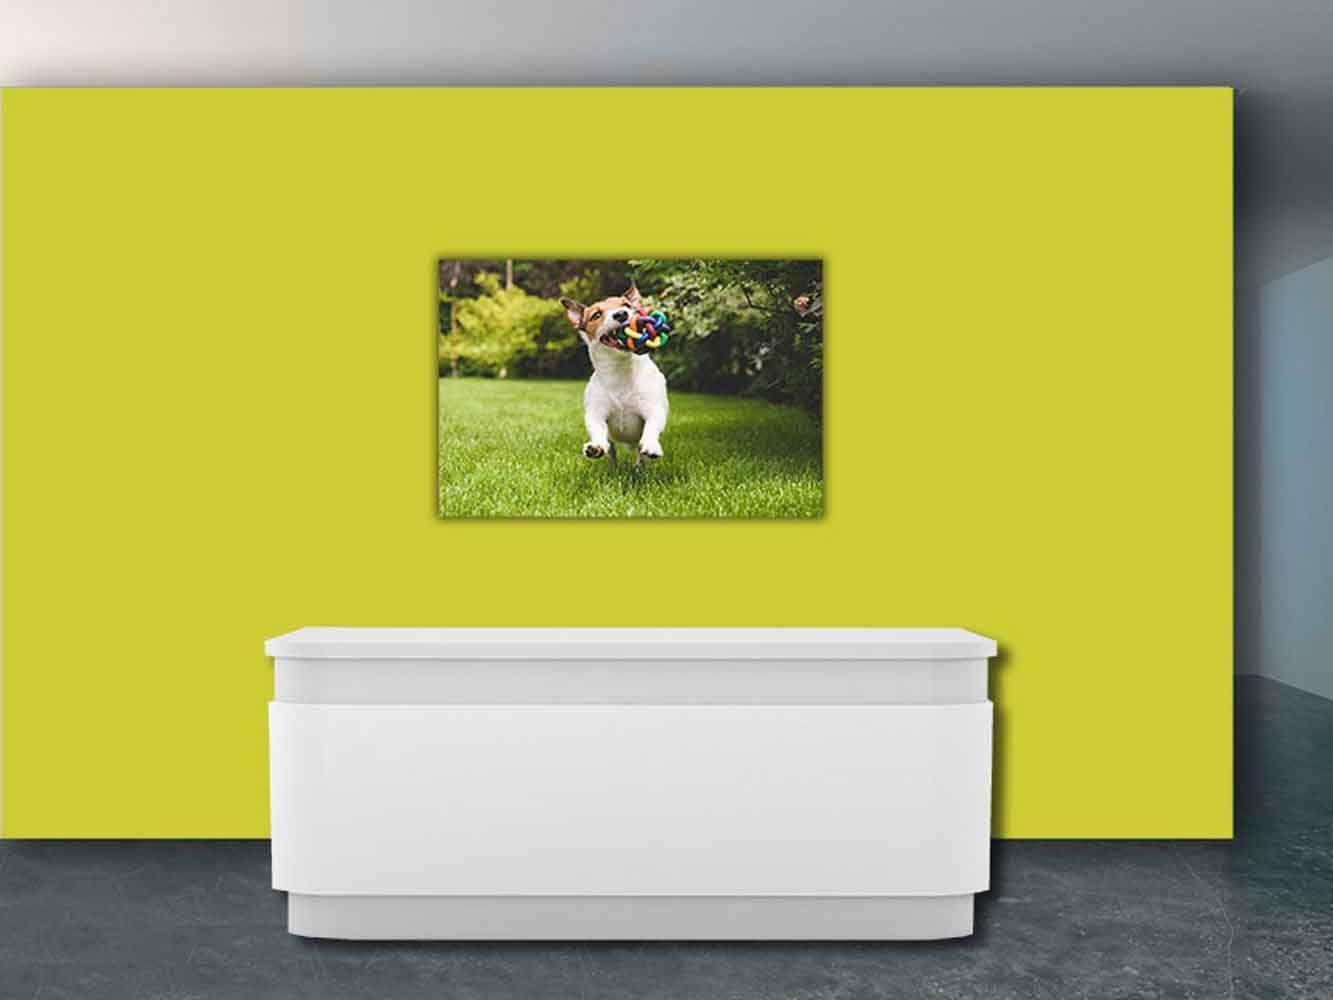 Fotomural Papel Pintado Perro y Juguete | Carteles XXL - Impresión carteleria publicitaria